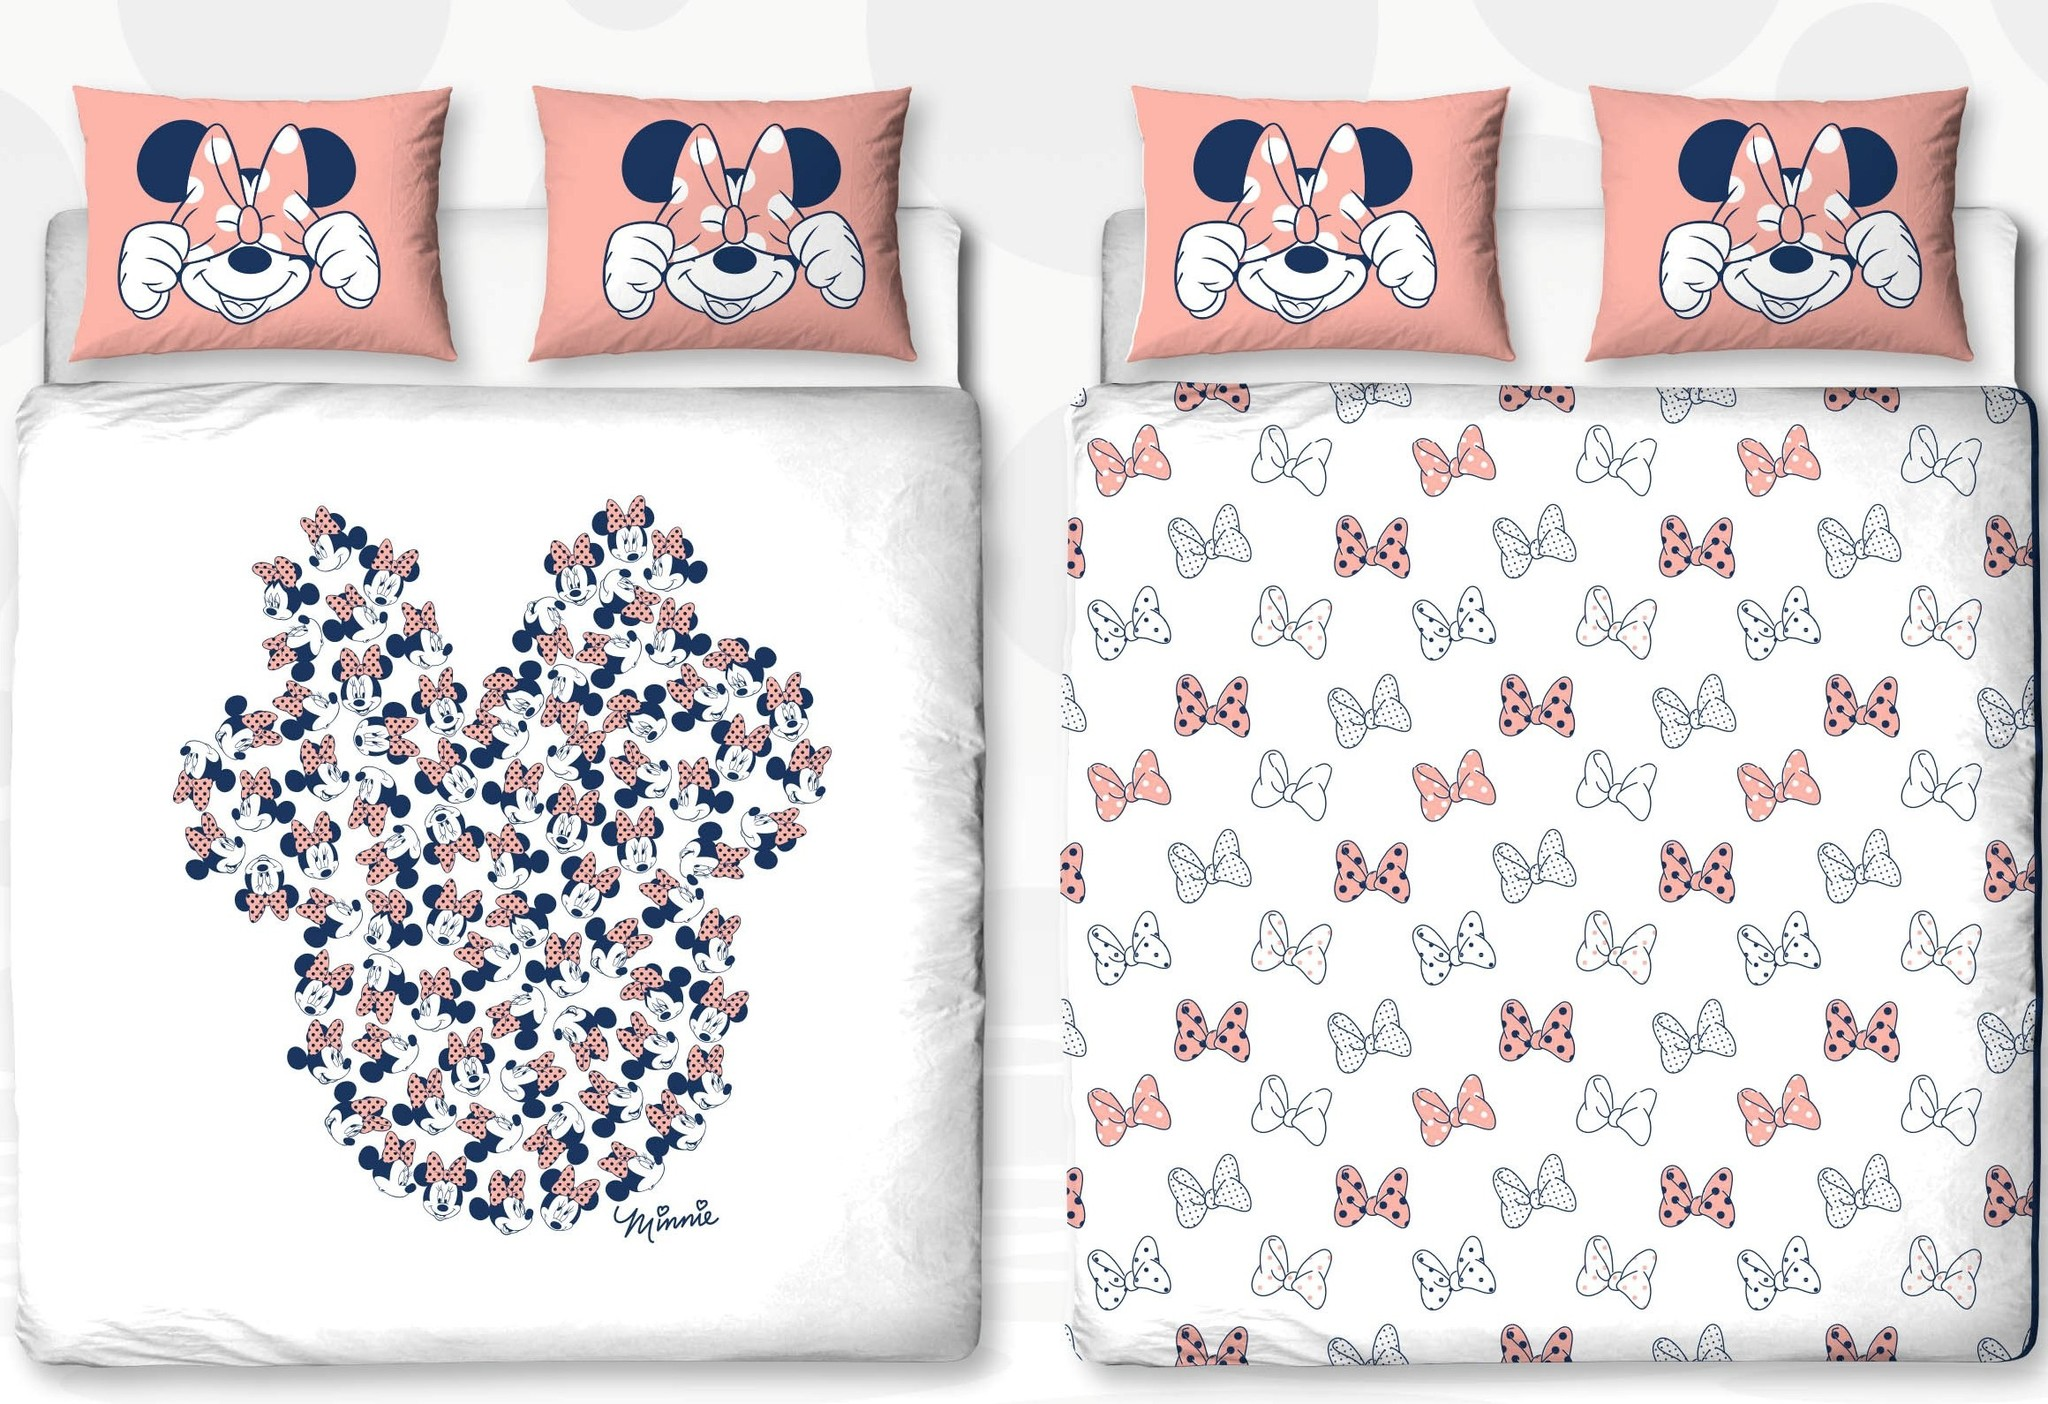 Minnie Mouse Dekbedovertrek 240x200cm